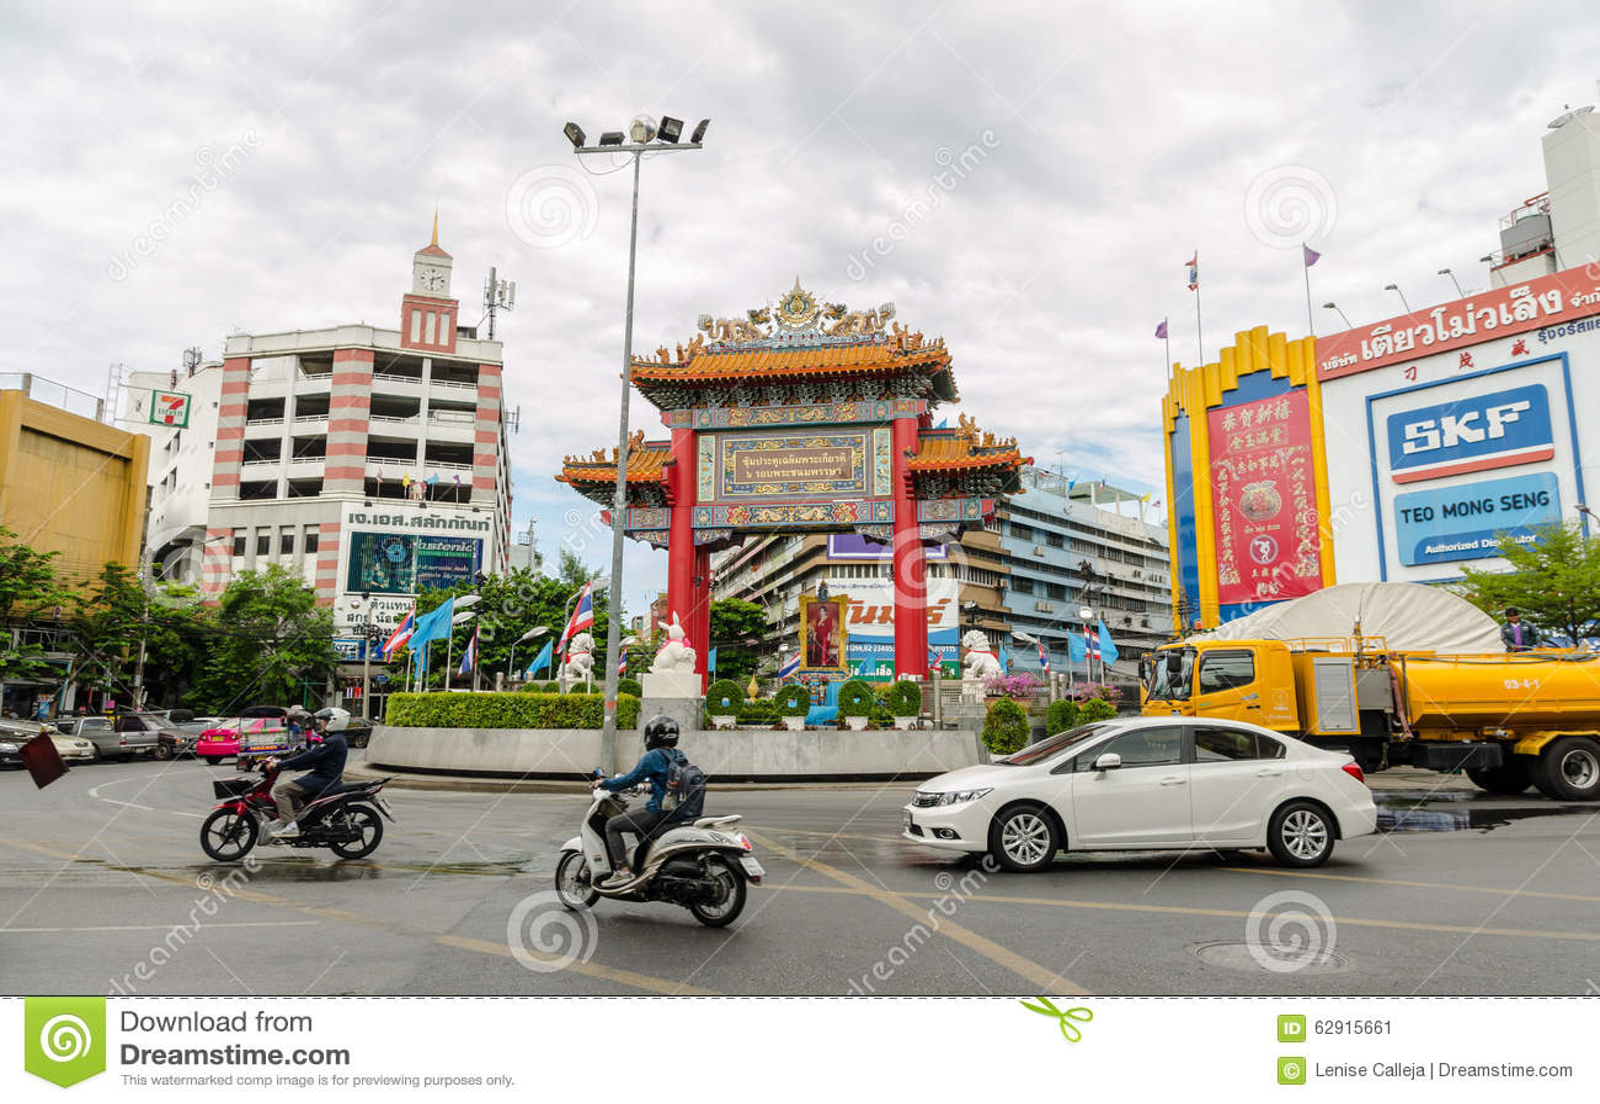 Poort van Chinatown in Bangkok, Thailand